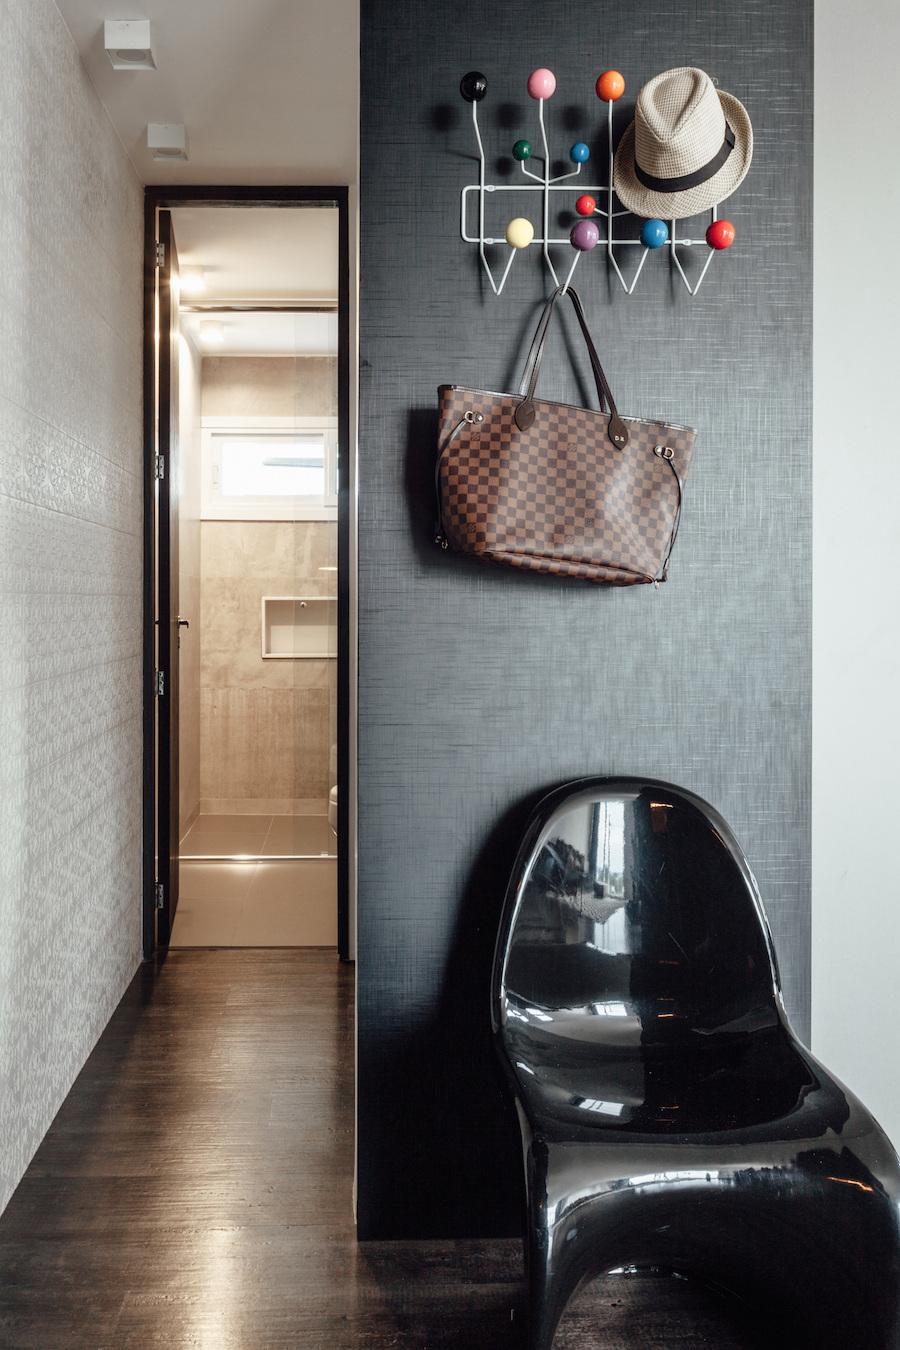 Casa ID House - Cadi Arquitetura19.jpg